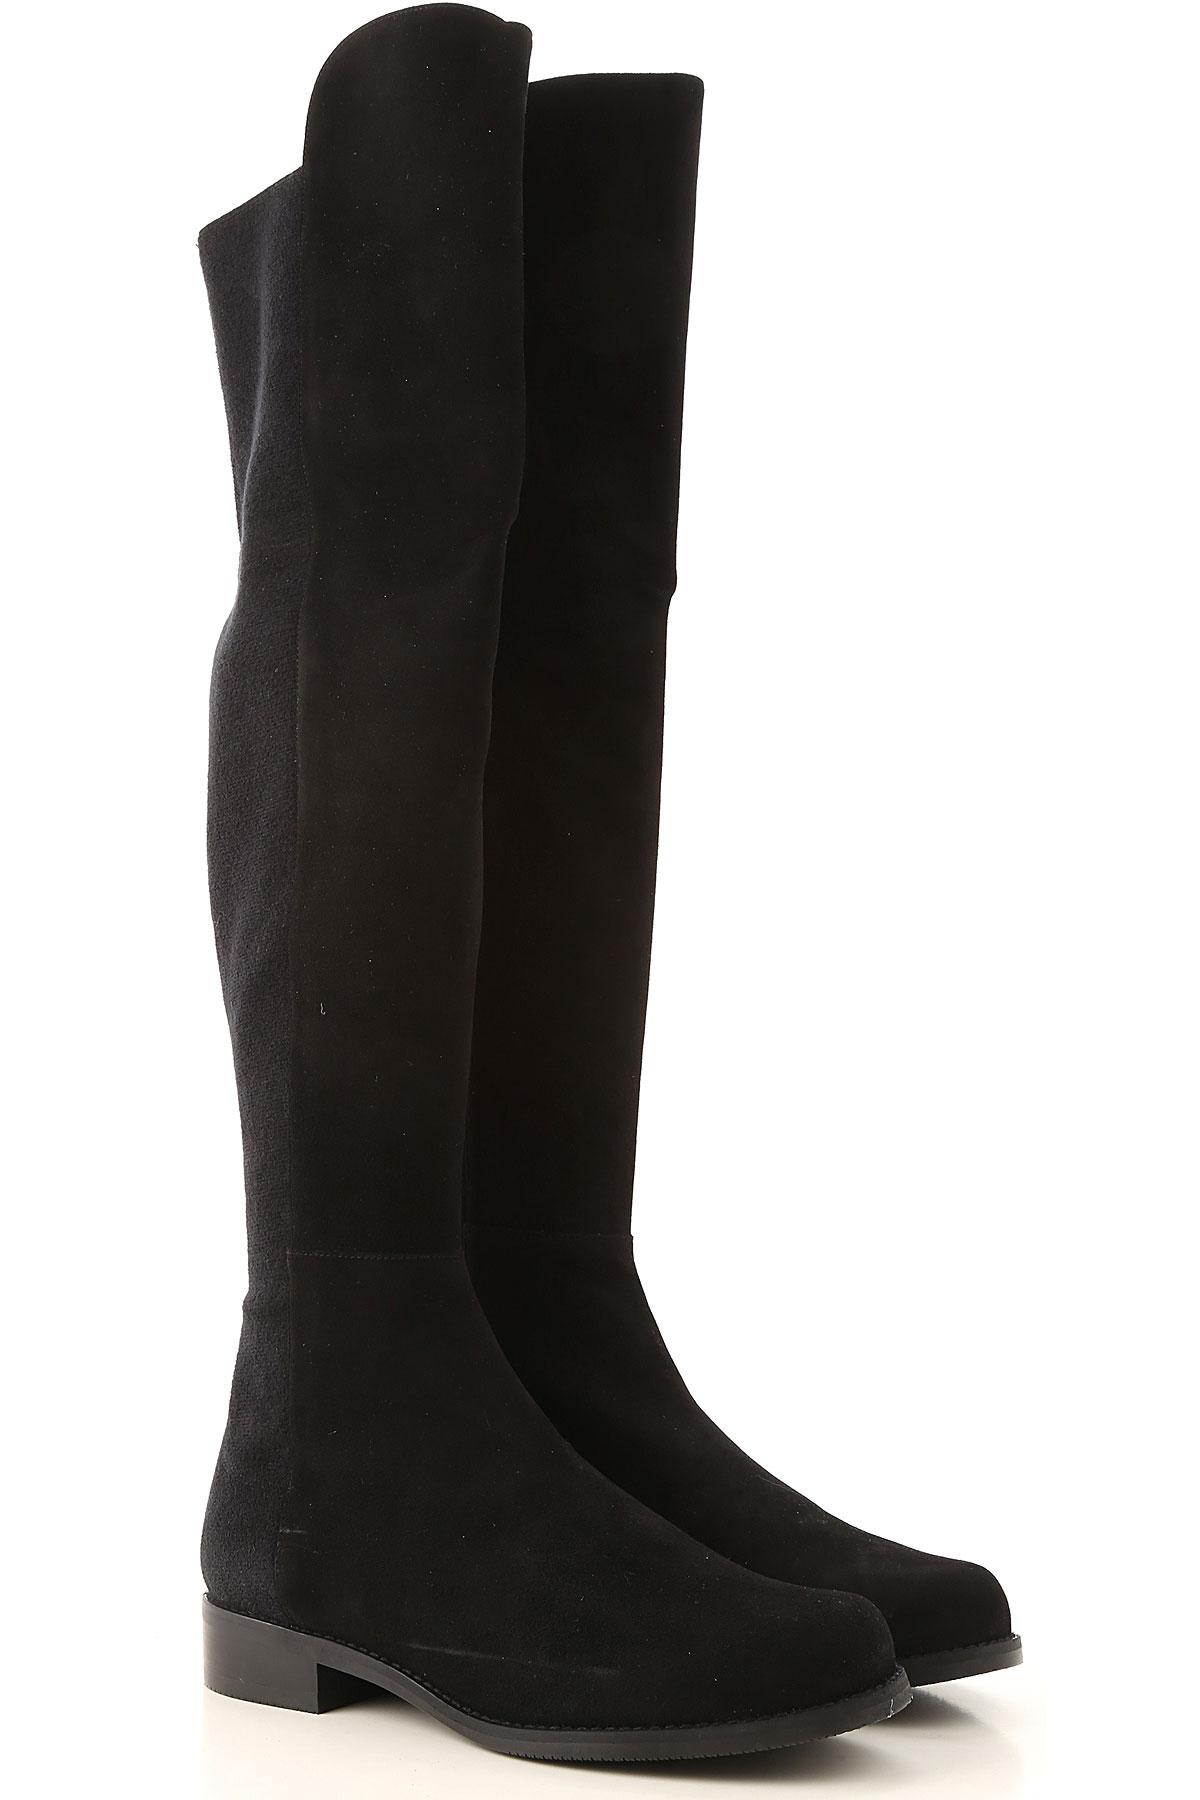 Stuart Weitzman Boots for Women, Booties On Sale, Black, suede, 2019, US 5 (EU 35.5) US 5.5 (EU 36)